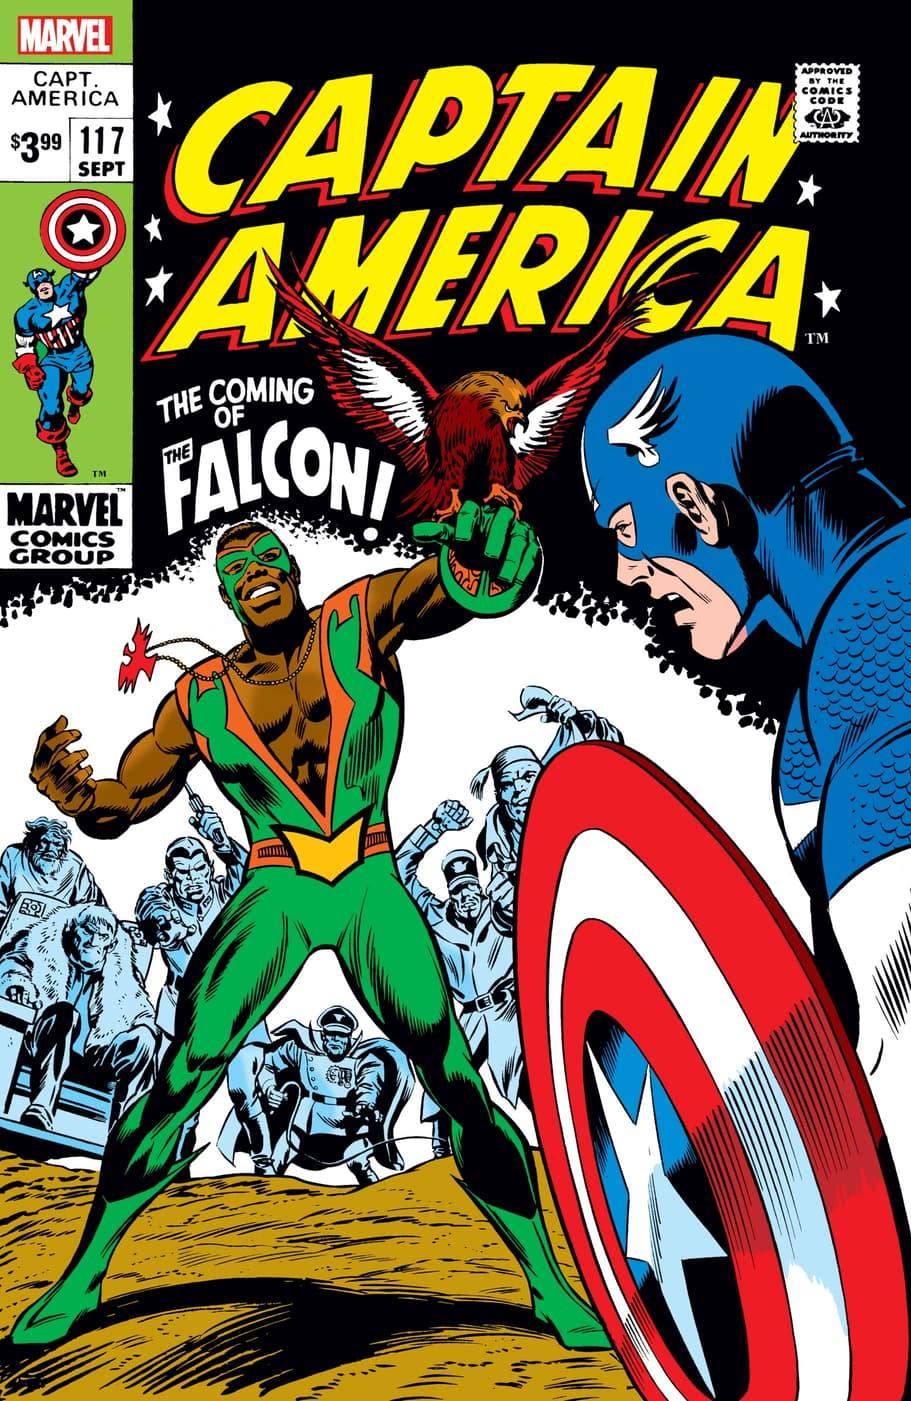 CAPTAIN AMERICA #117 Facsimile Edition